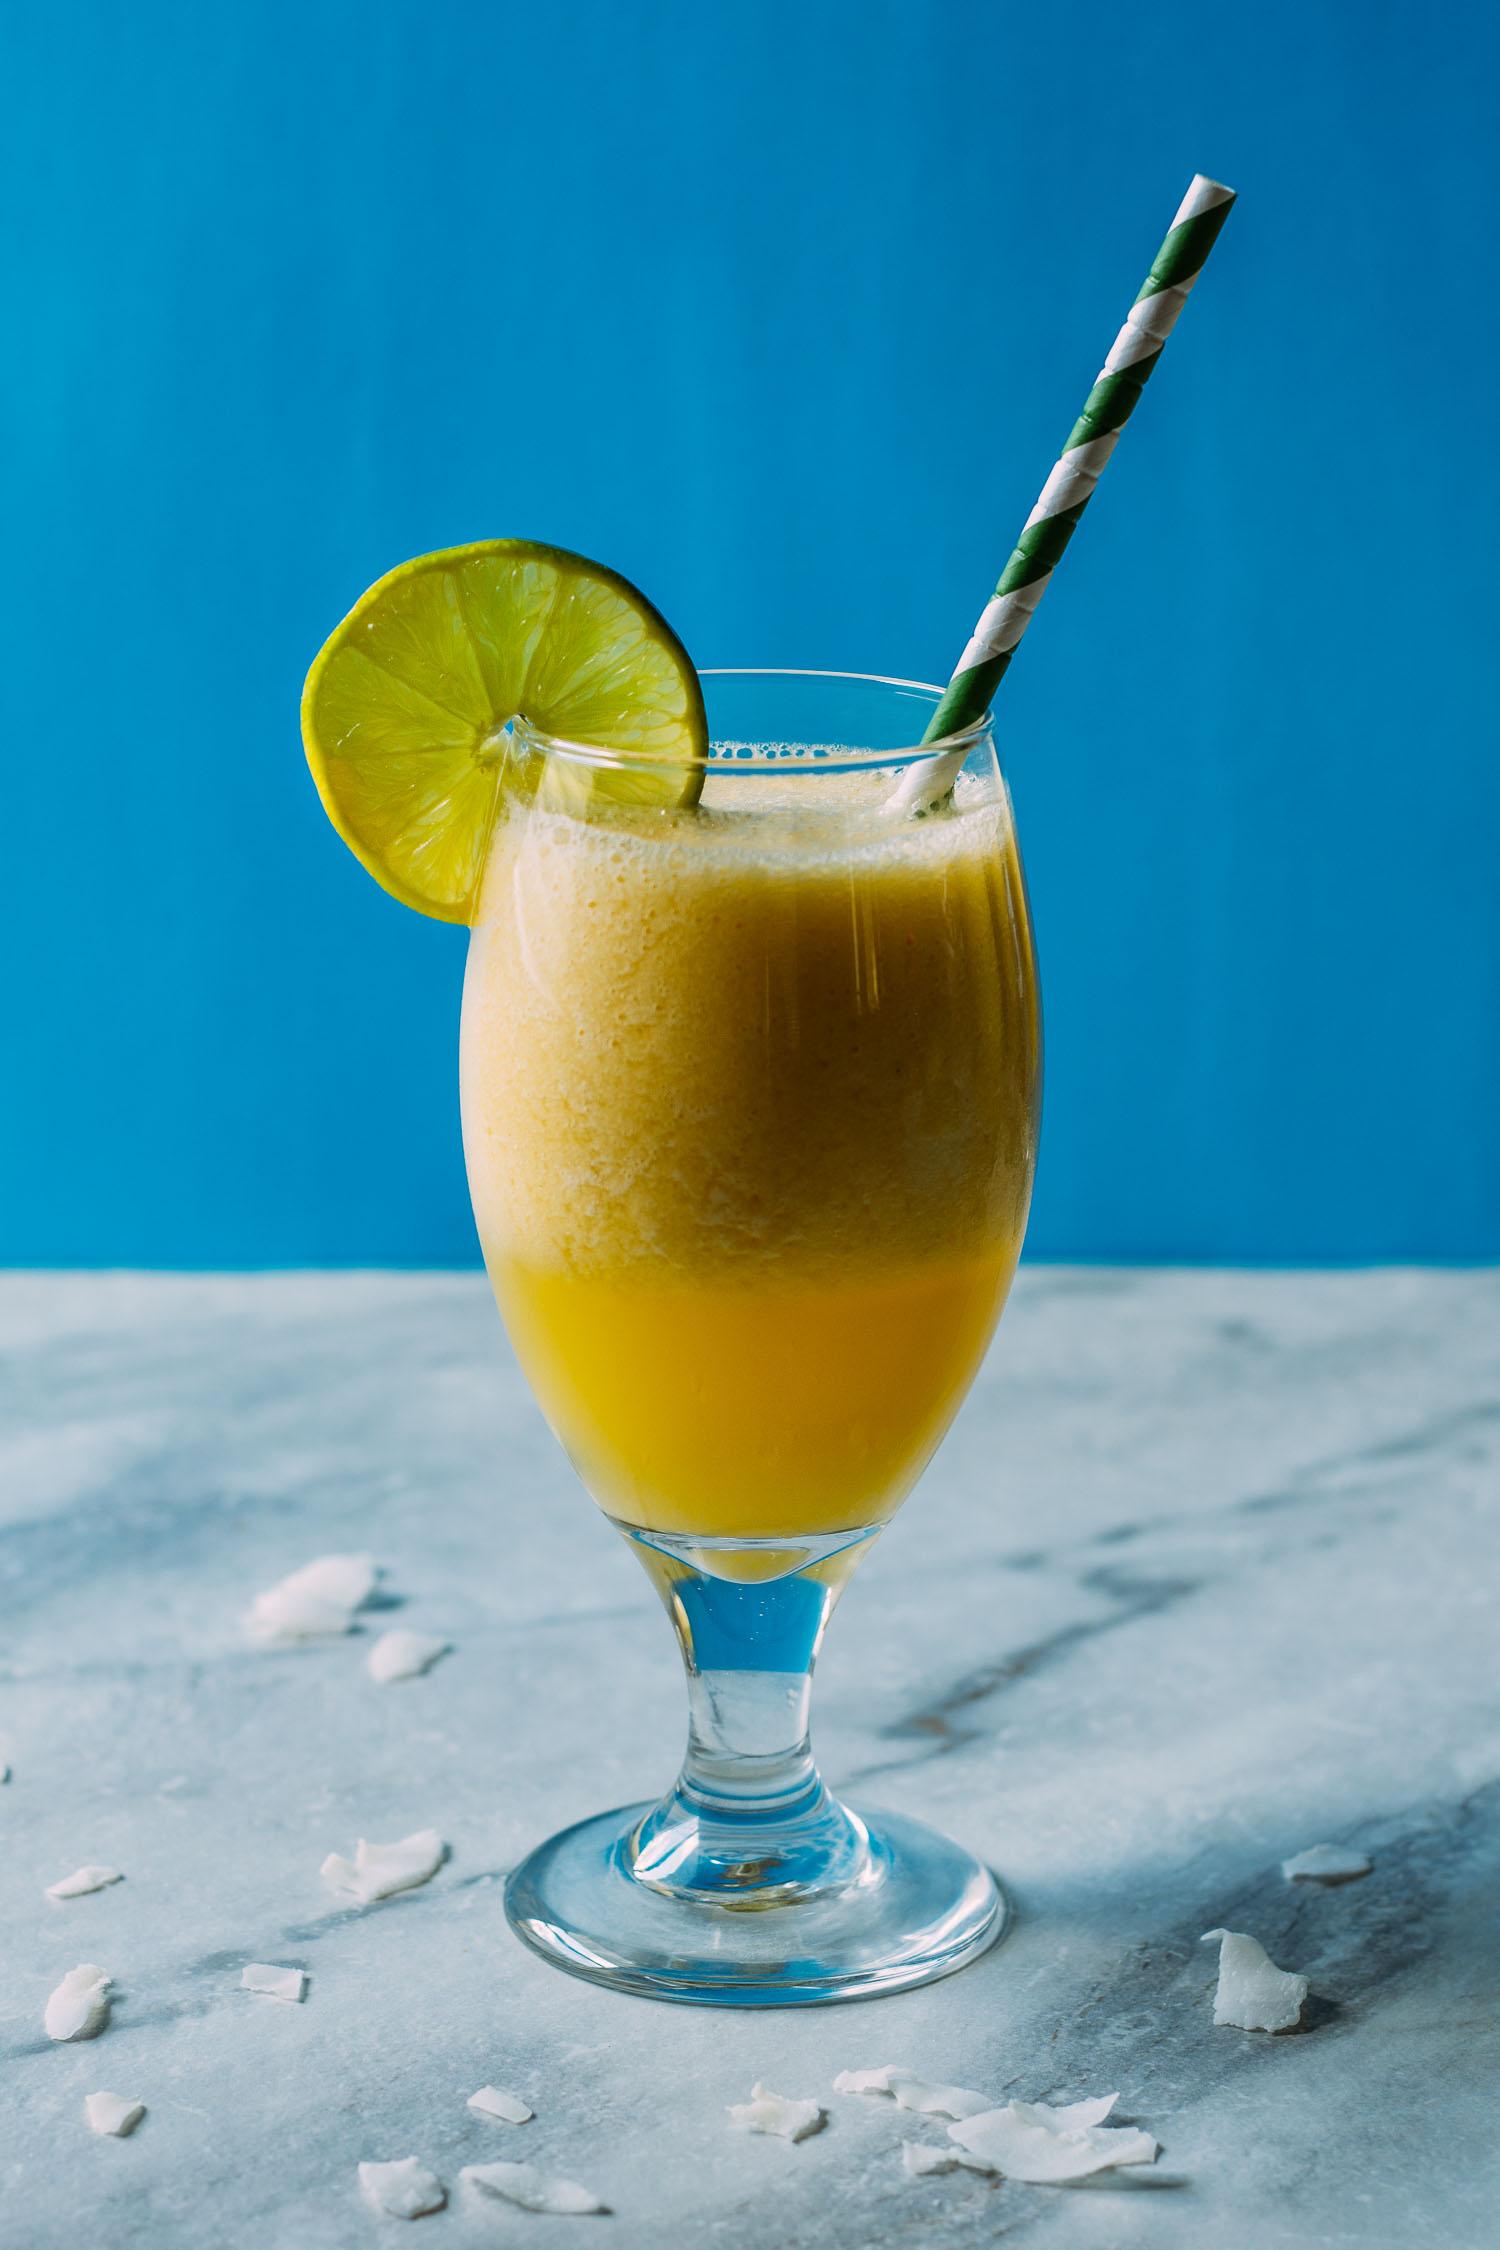 Refreshingly Lite Pina Colada Mango Smoothie #fruit #drink #summertime #recipes #entertaining #wfpb